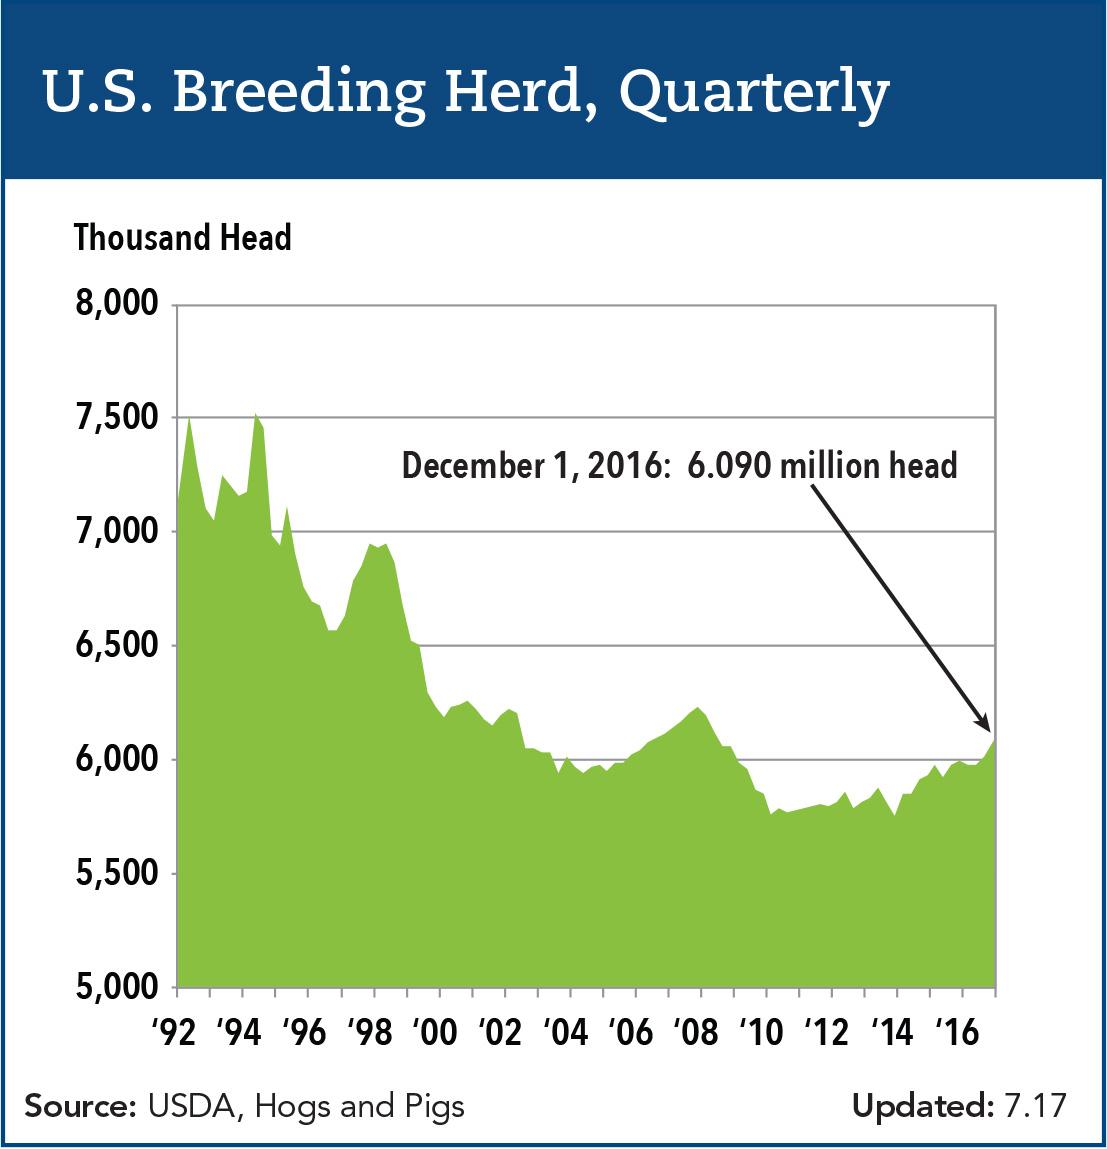 u.s. breeding herd quarterly